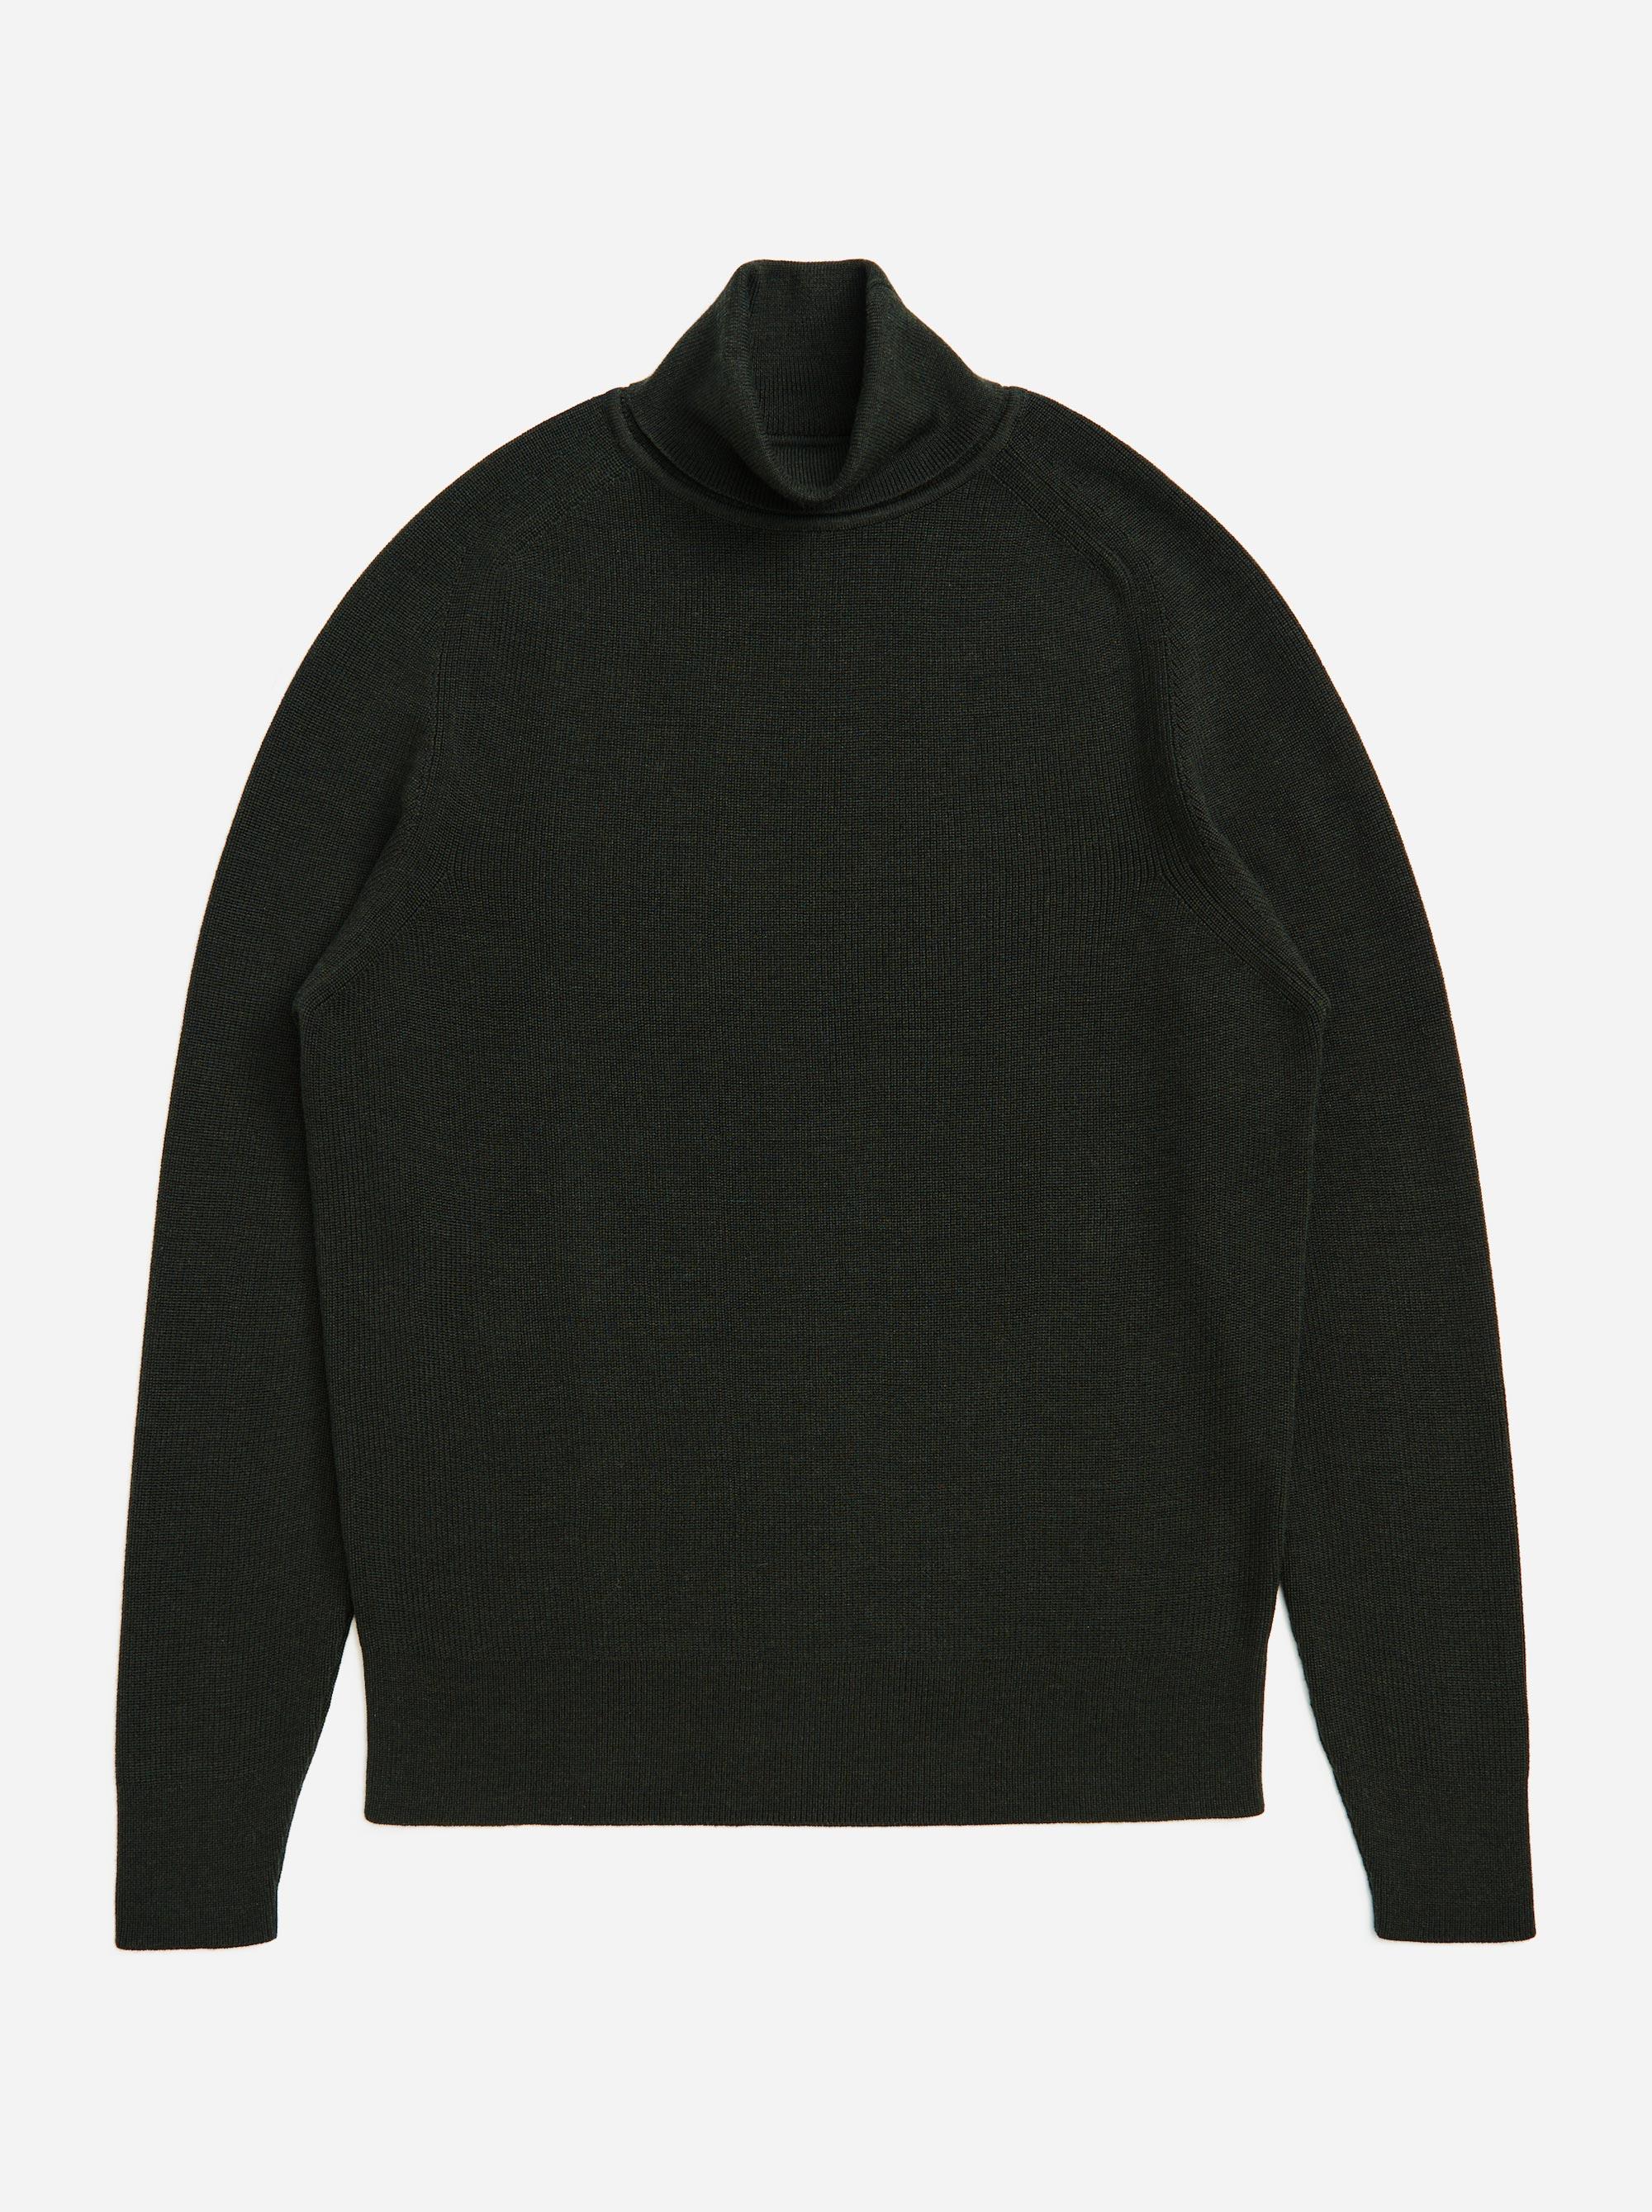 Teym - Turtleneck - The Merino Sweater - Women - Green - 4